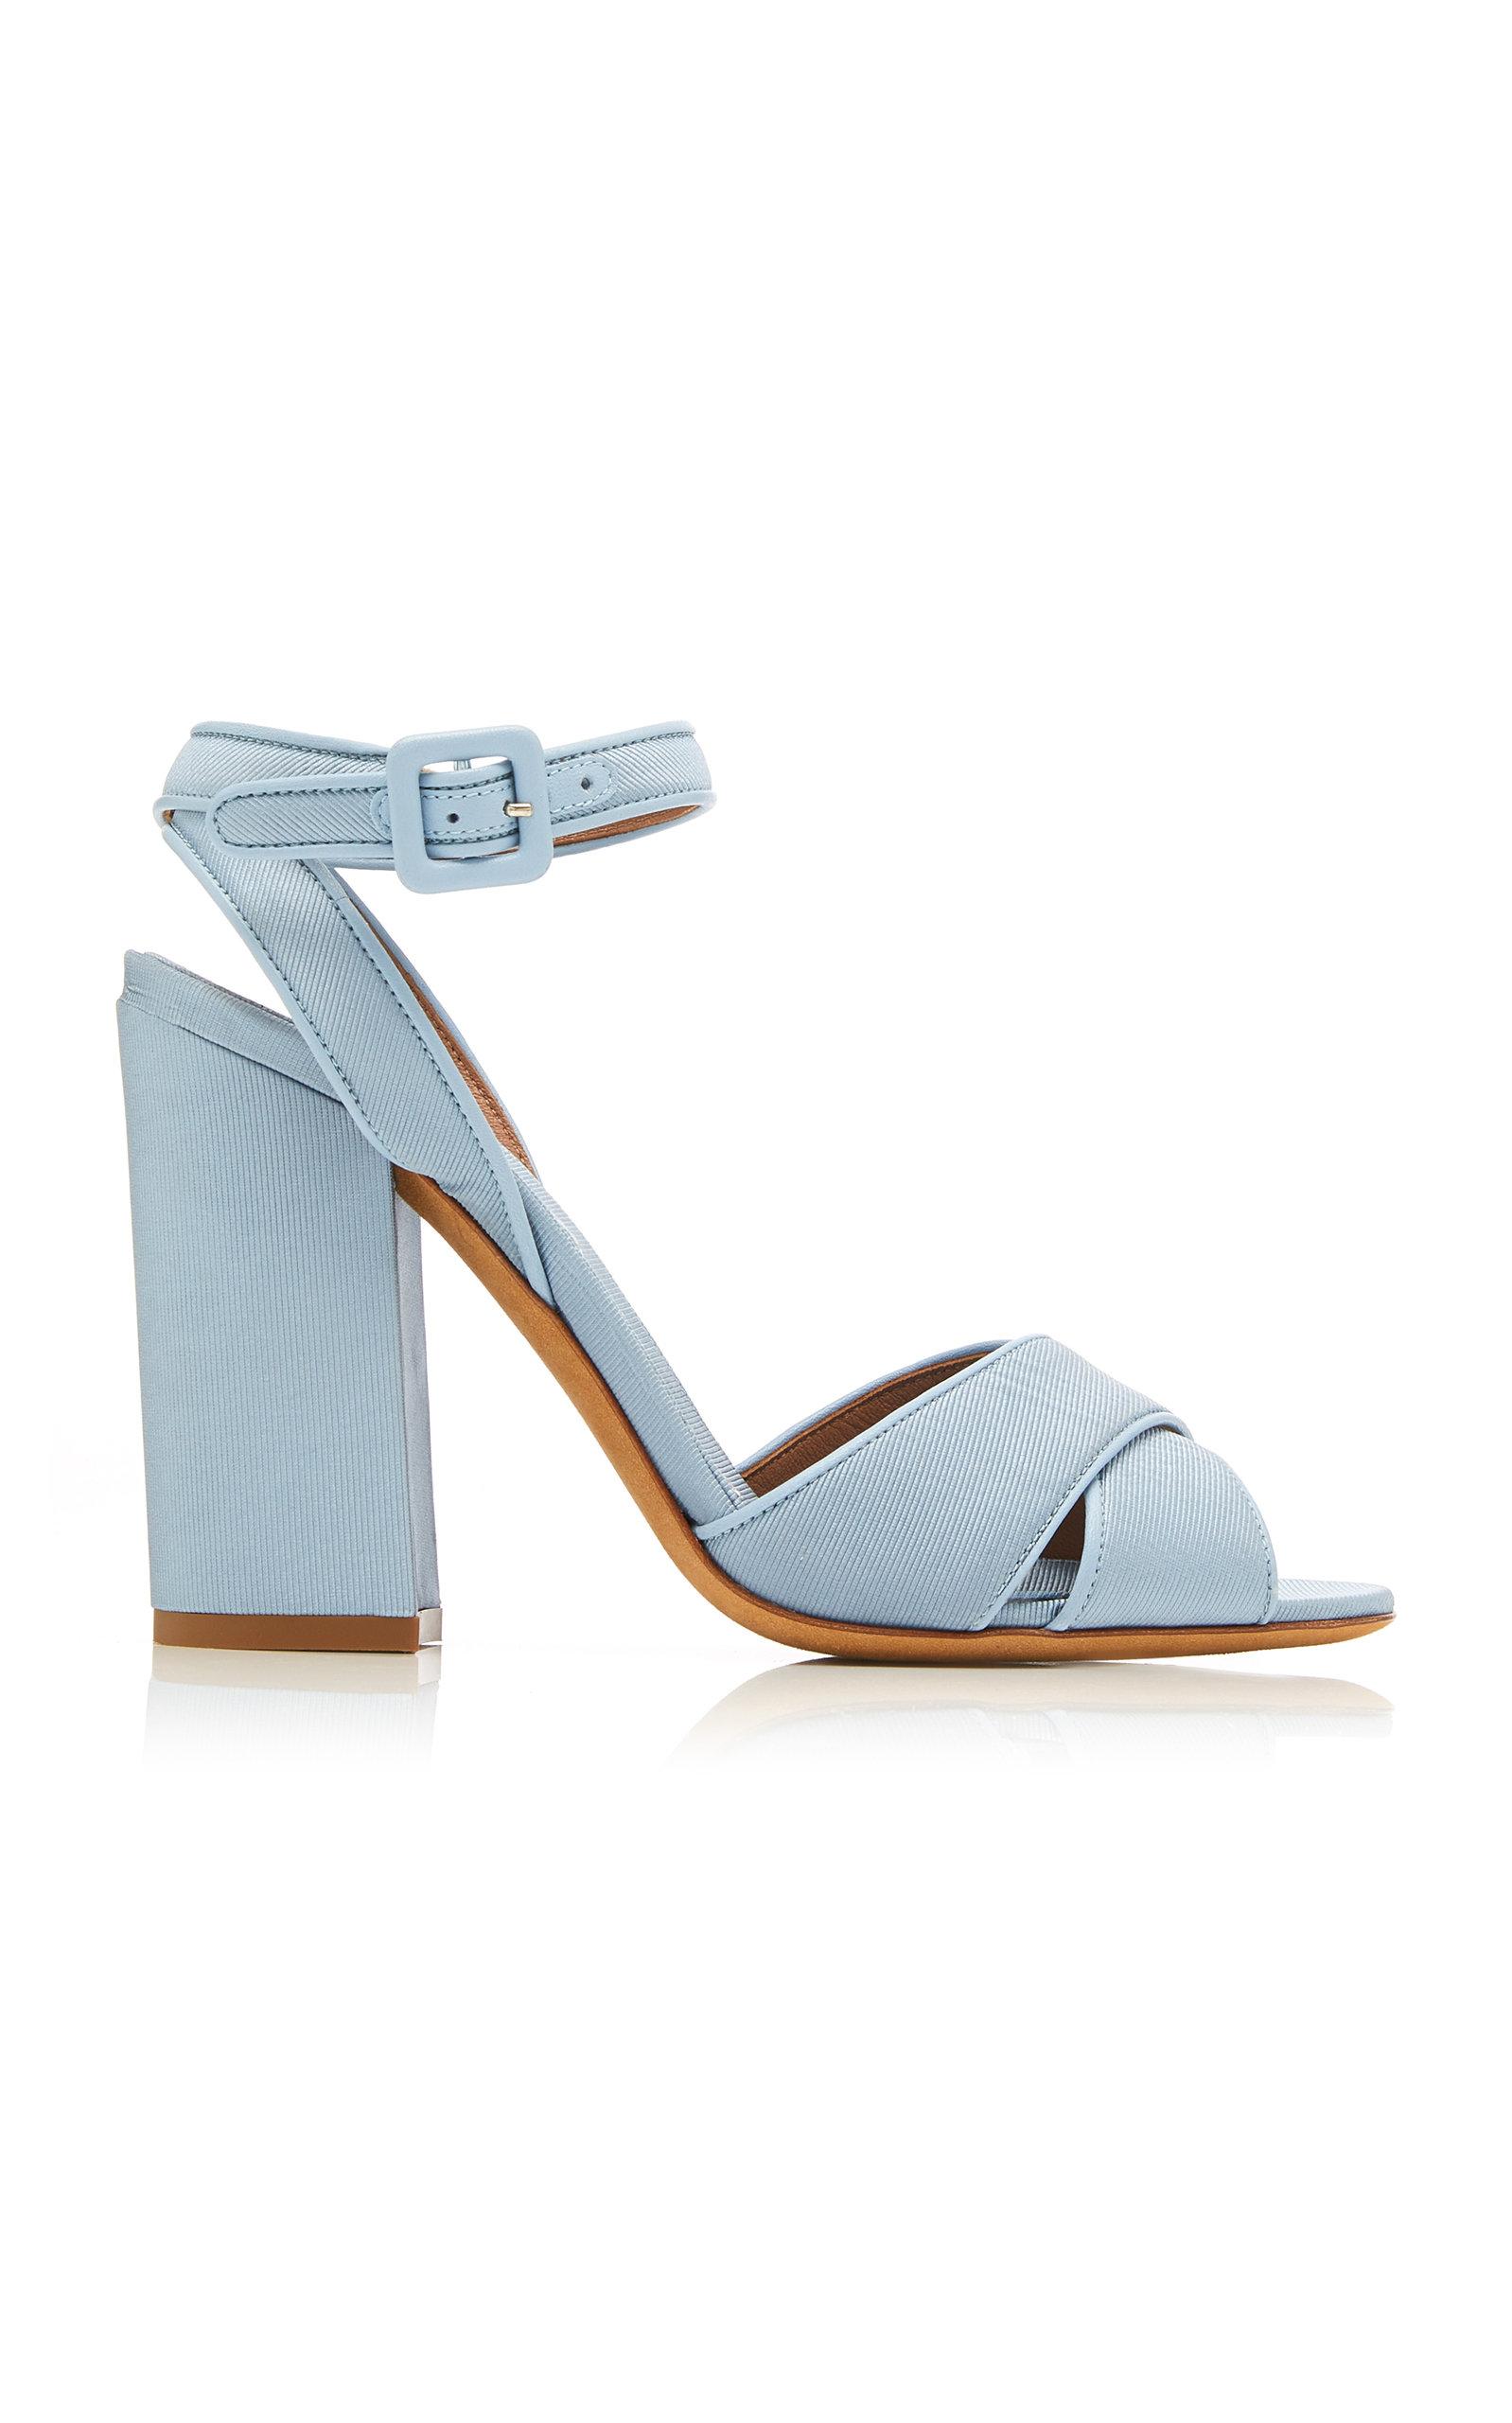 Tabitha Simmons Sandals Connie Satin-Twill Sandals